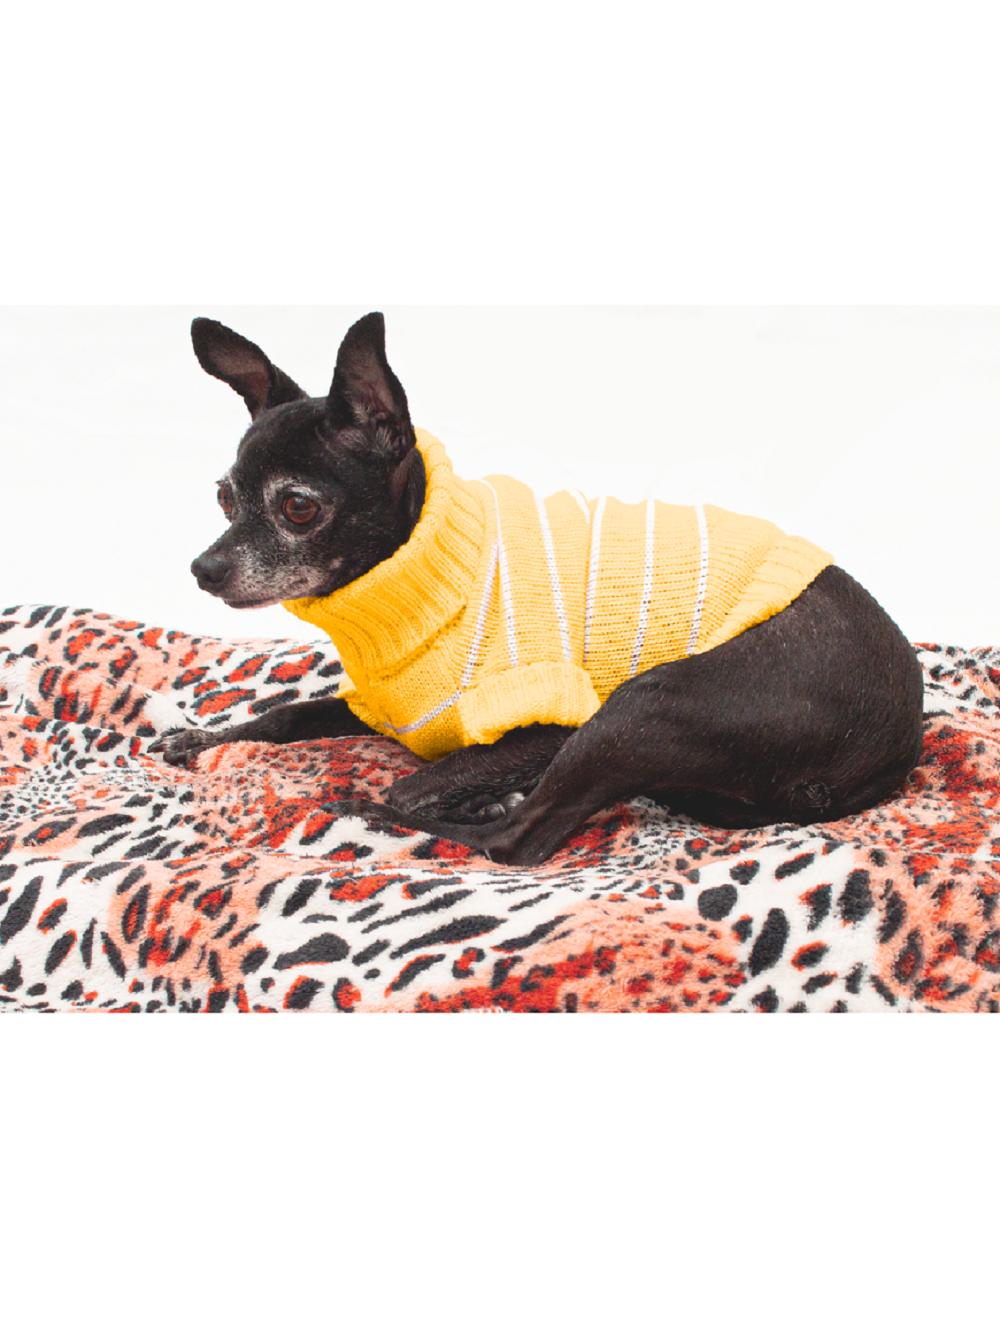 Saco Mandy para Perros Amarillo XL - Ciudaddemascotas.com